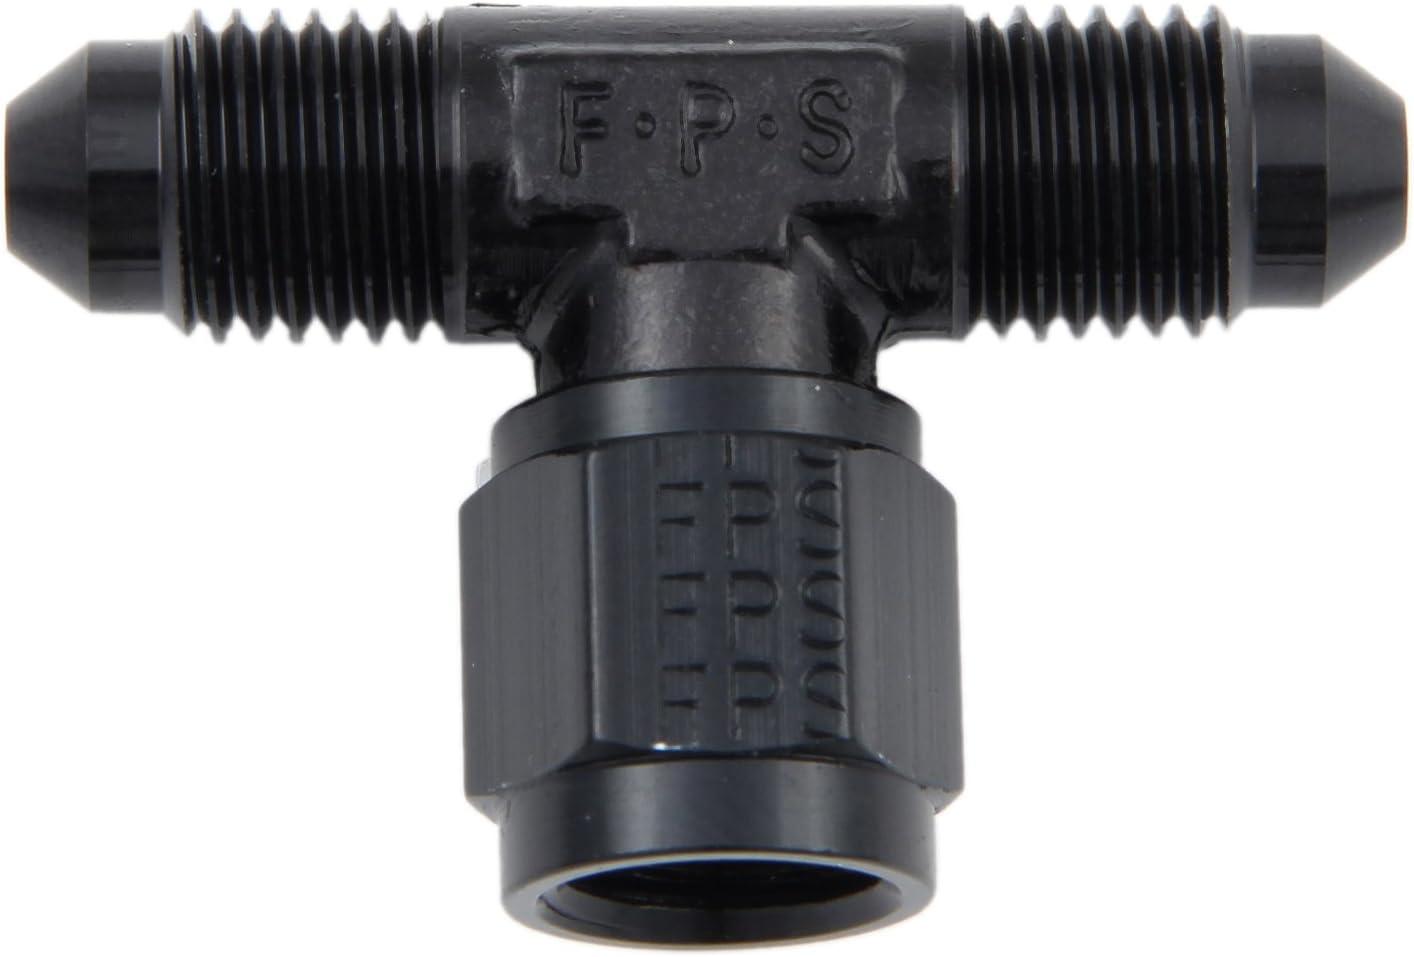 Fragola 498203 Tee Female Adapter